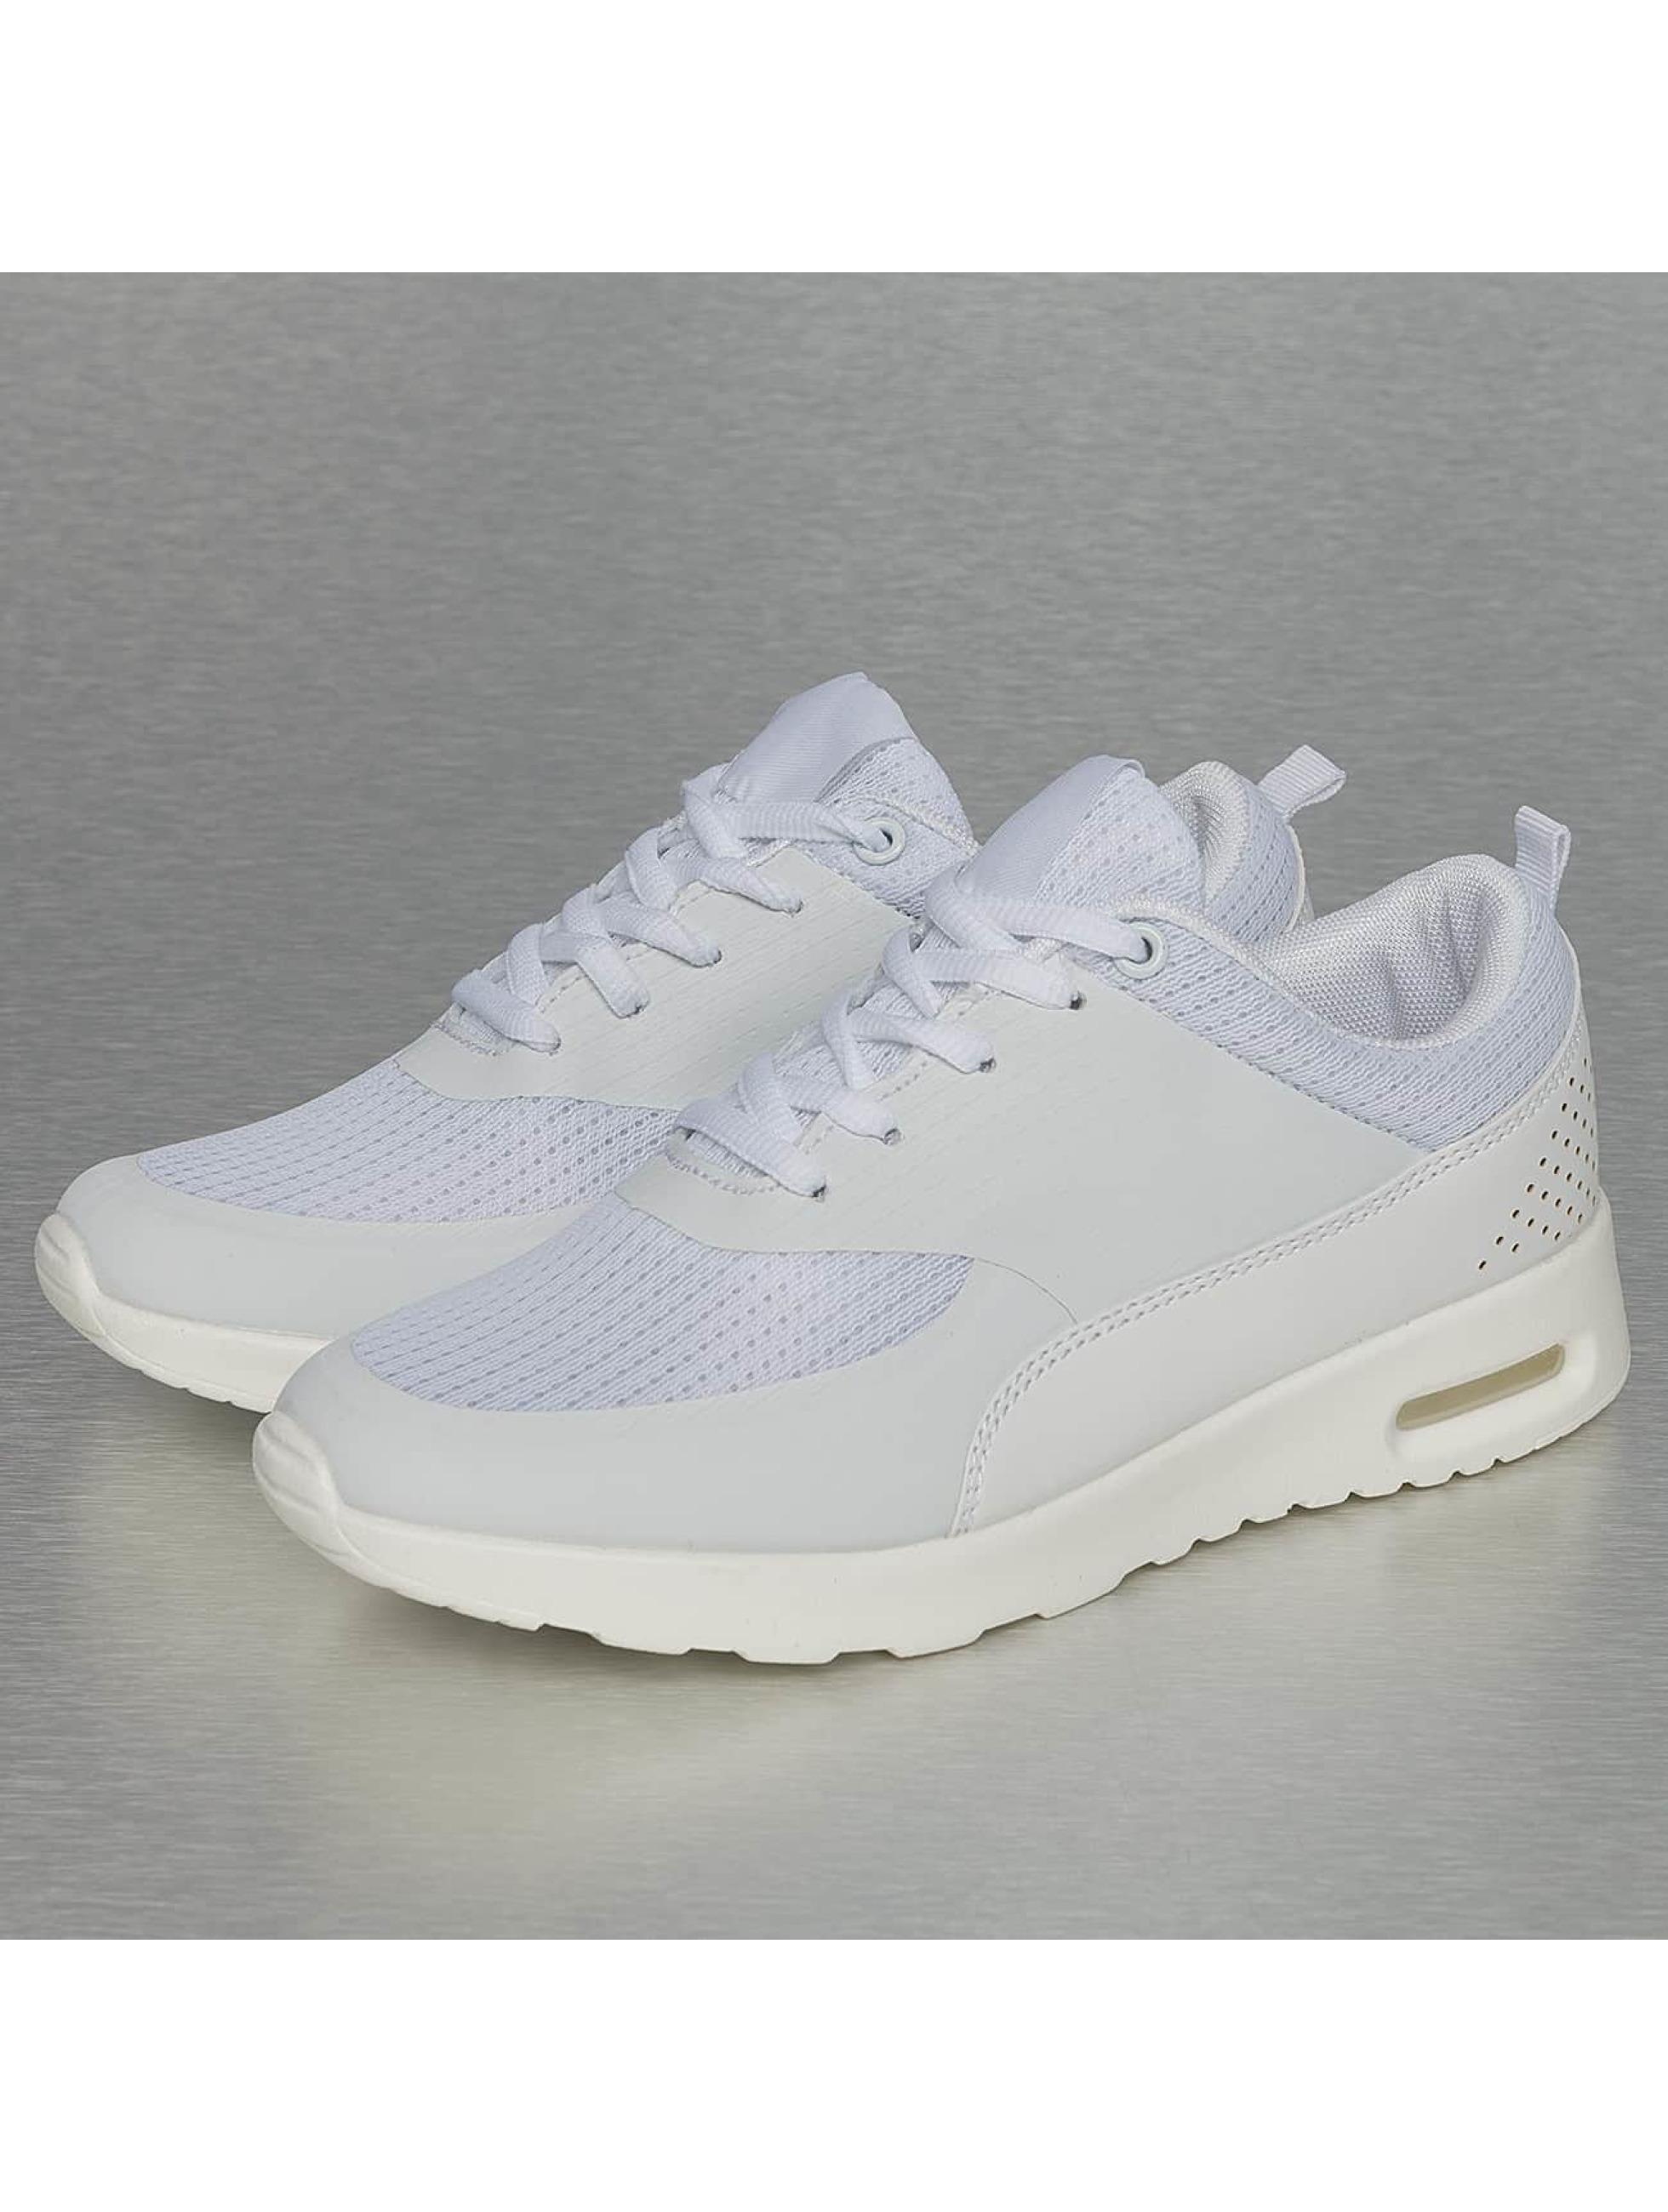 Jumex Frauen Sneaker Basic Sport in weiß